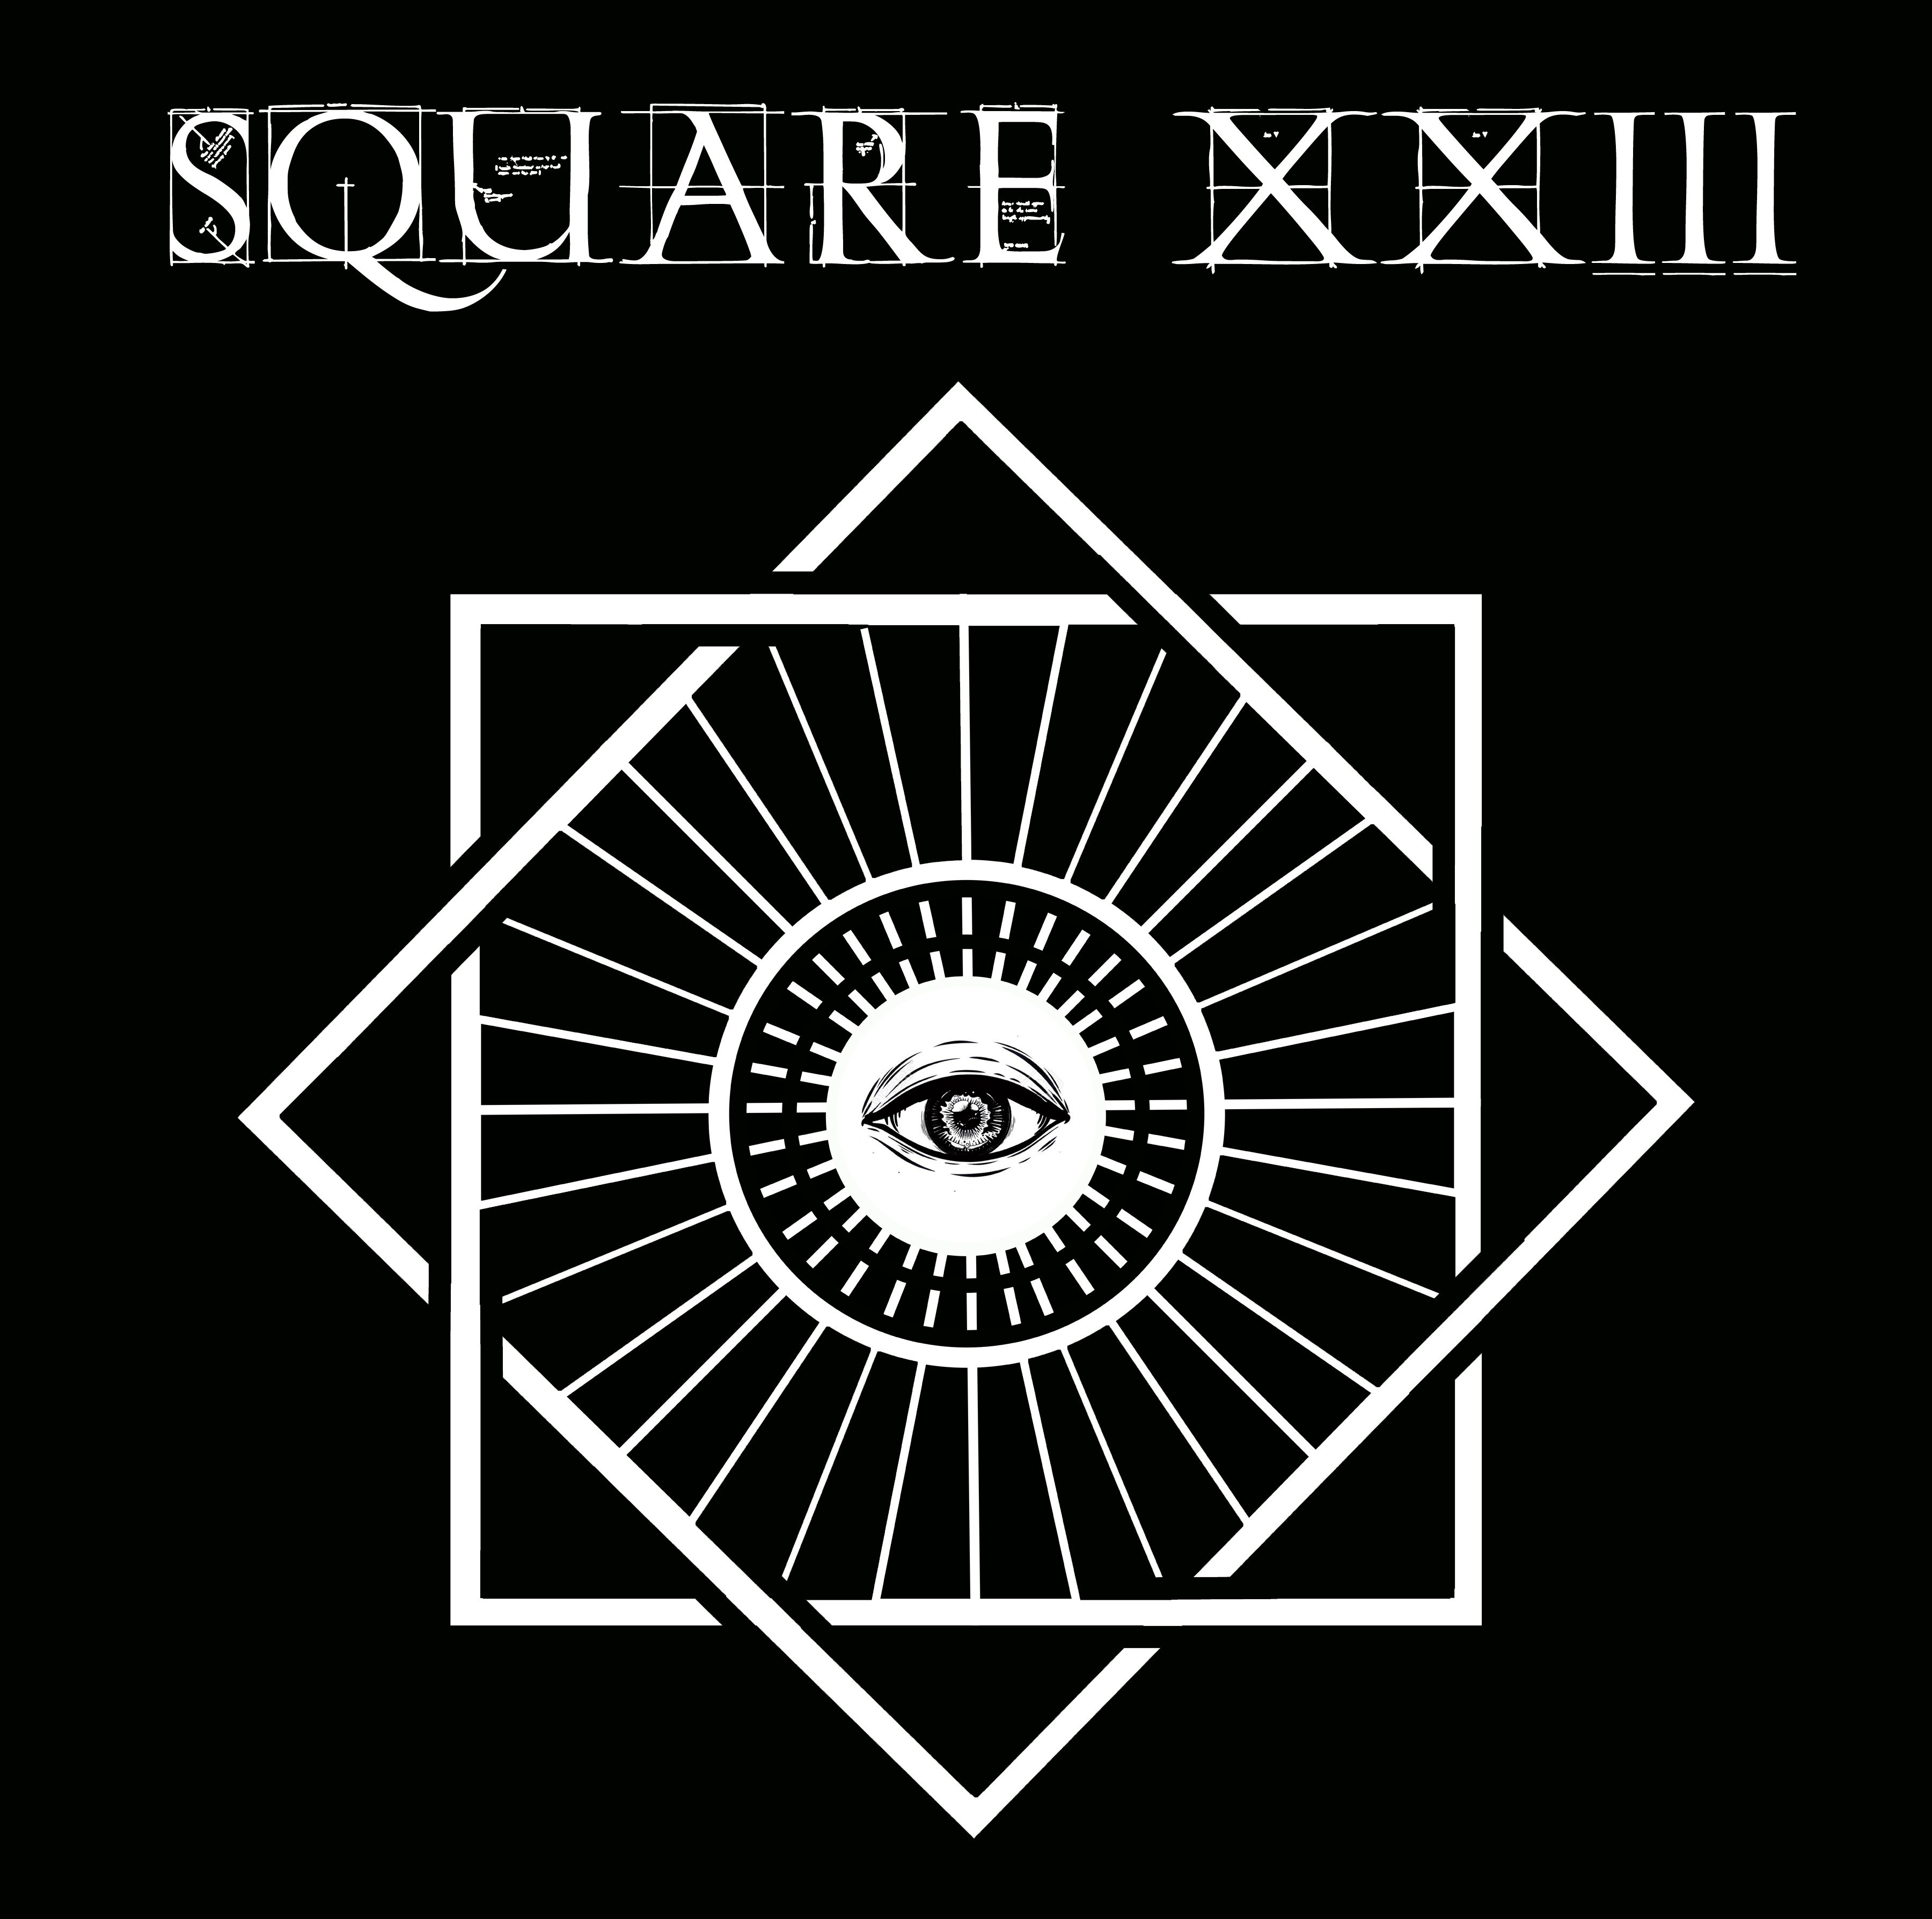 cropped-logo-black-3.jpg